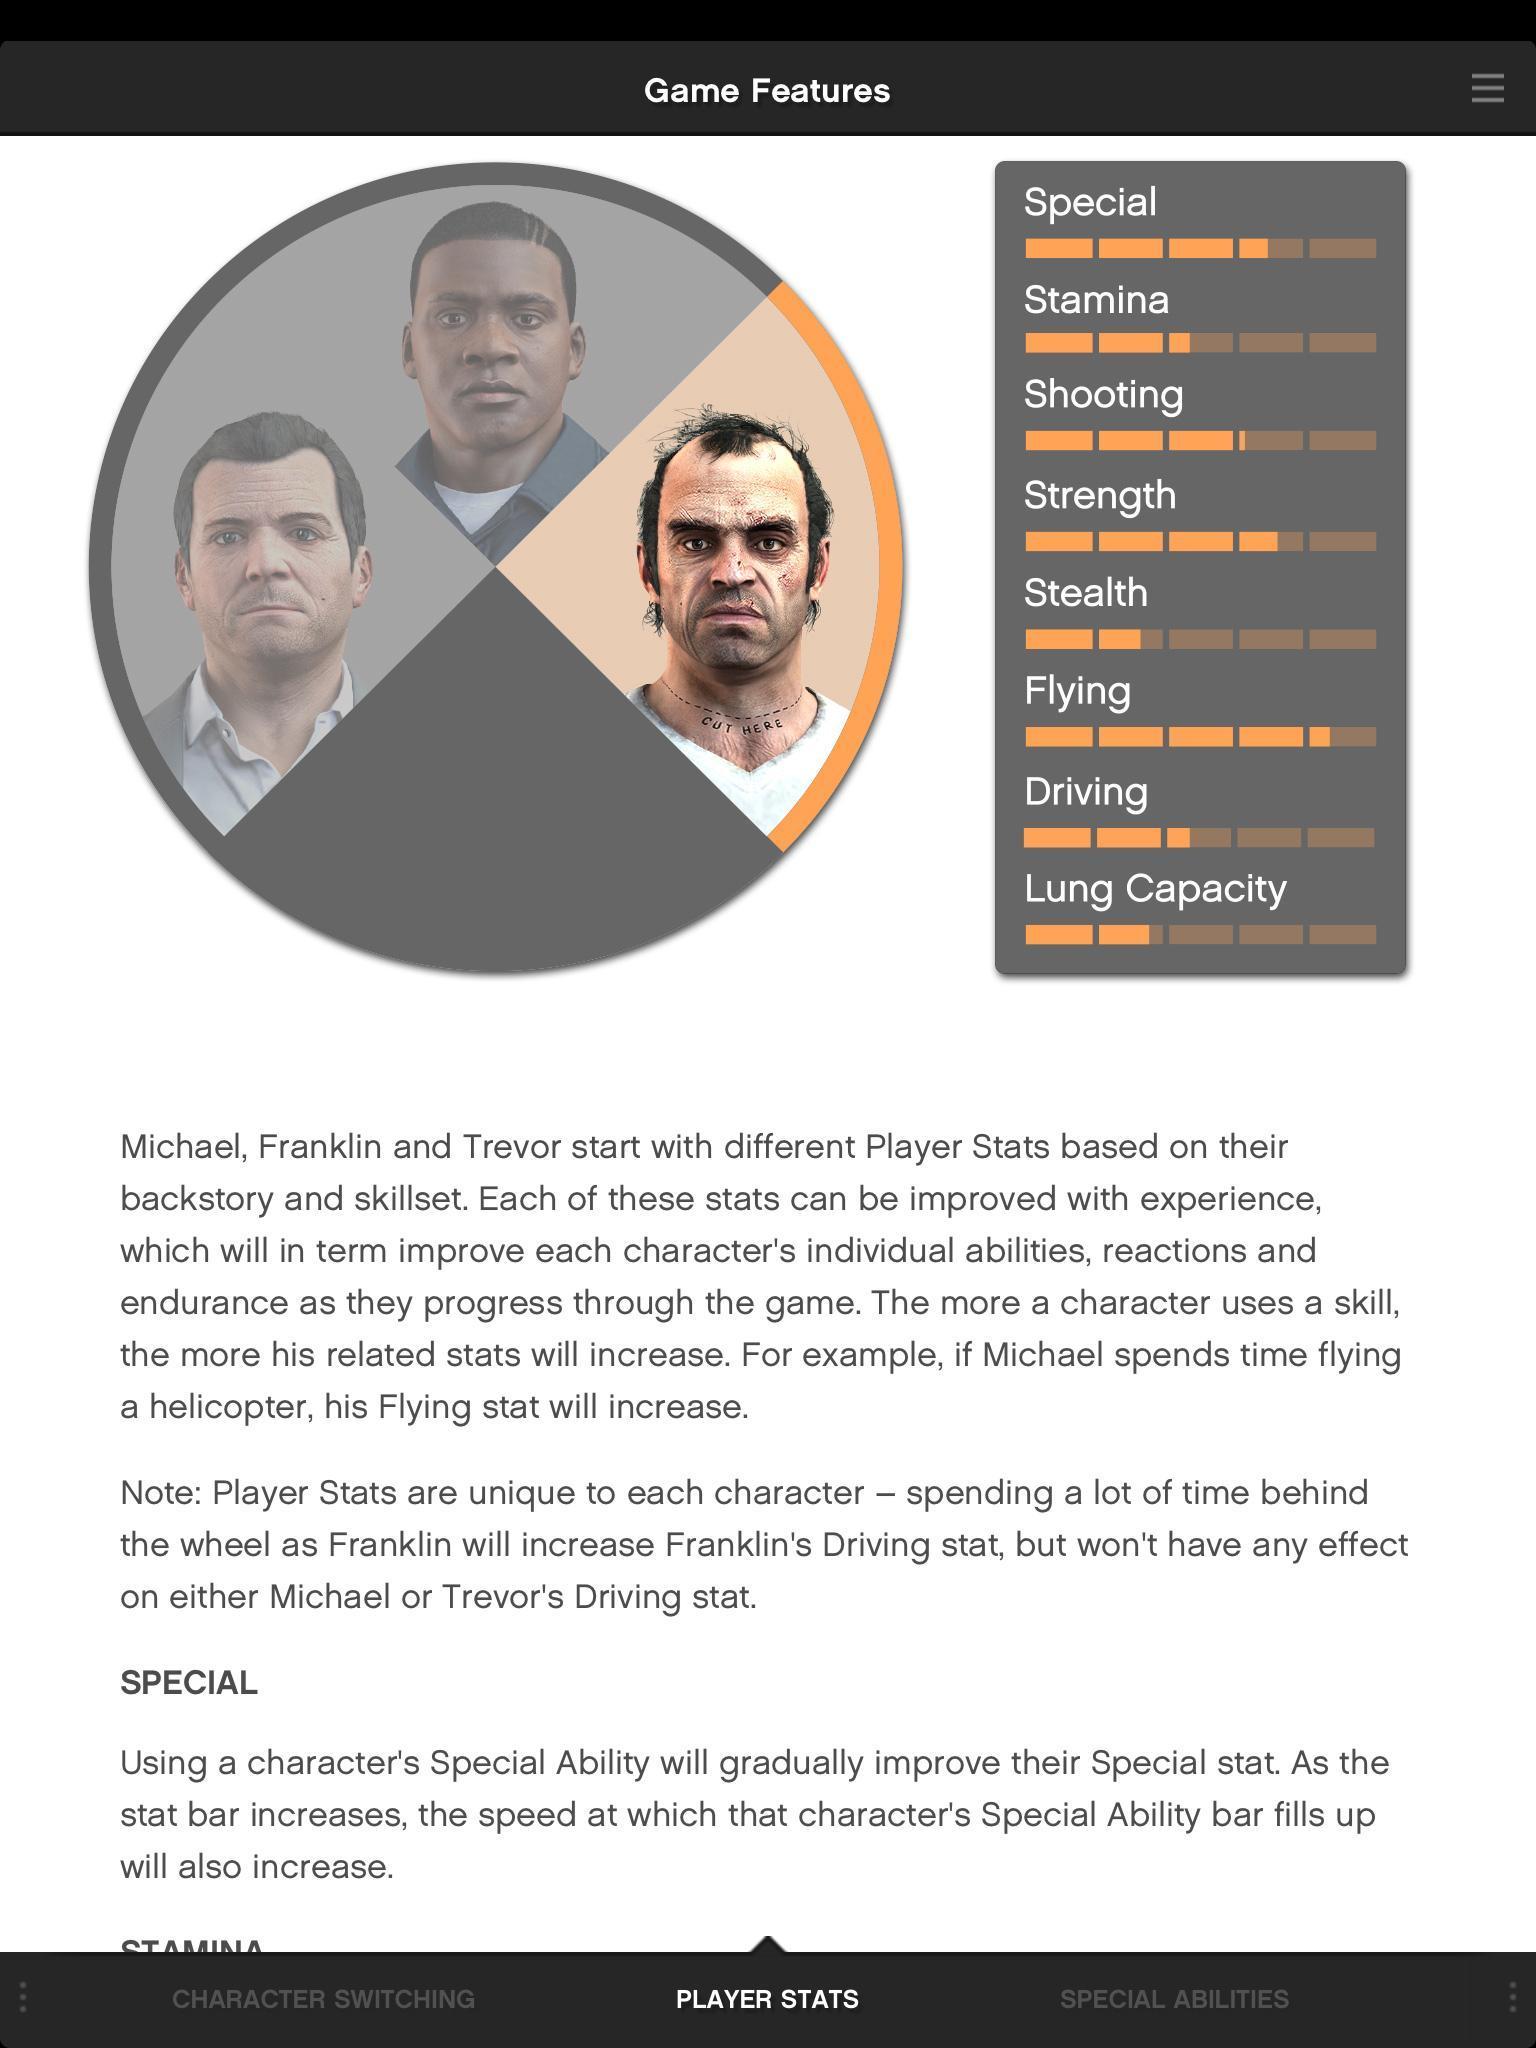 Grand Theft Auto V: The Manual 5.0.12 Screenshot 4